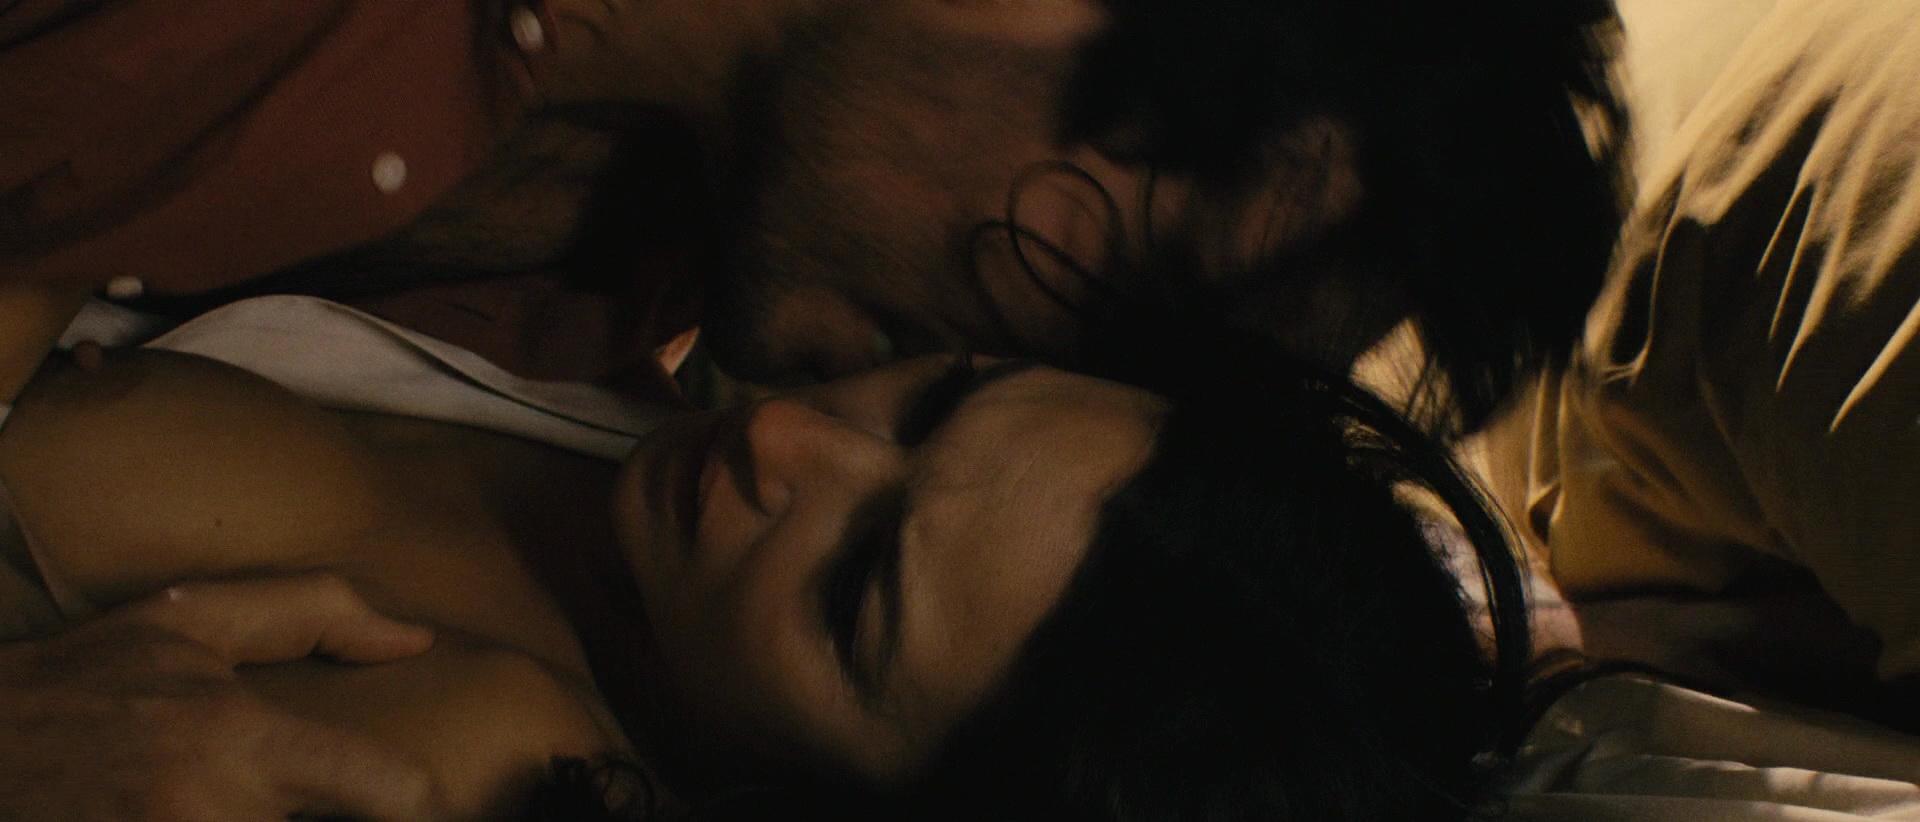 photo Monica bellucci nude sex scene in dont look back movie